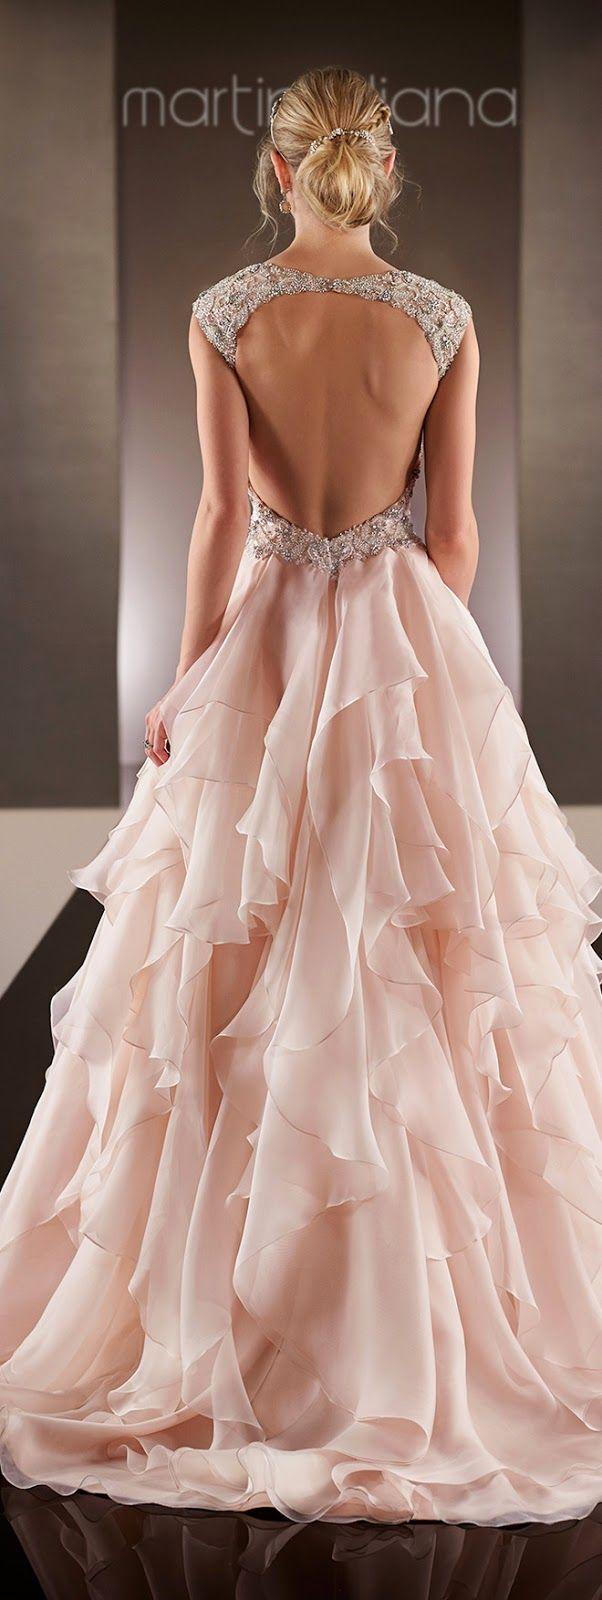 Glamorous Blush Wedding Ideas to Inspire - blush wedding dress; Martina Liana 2015